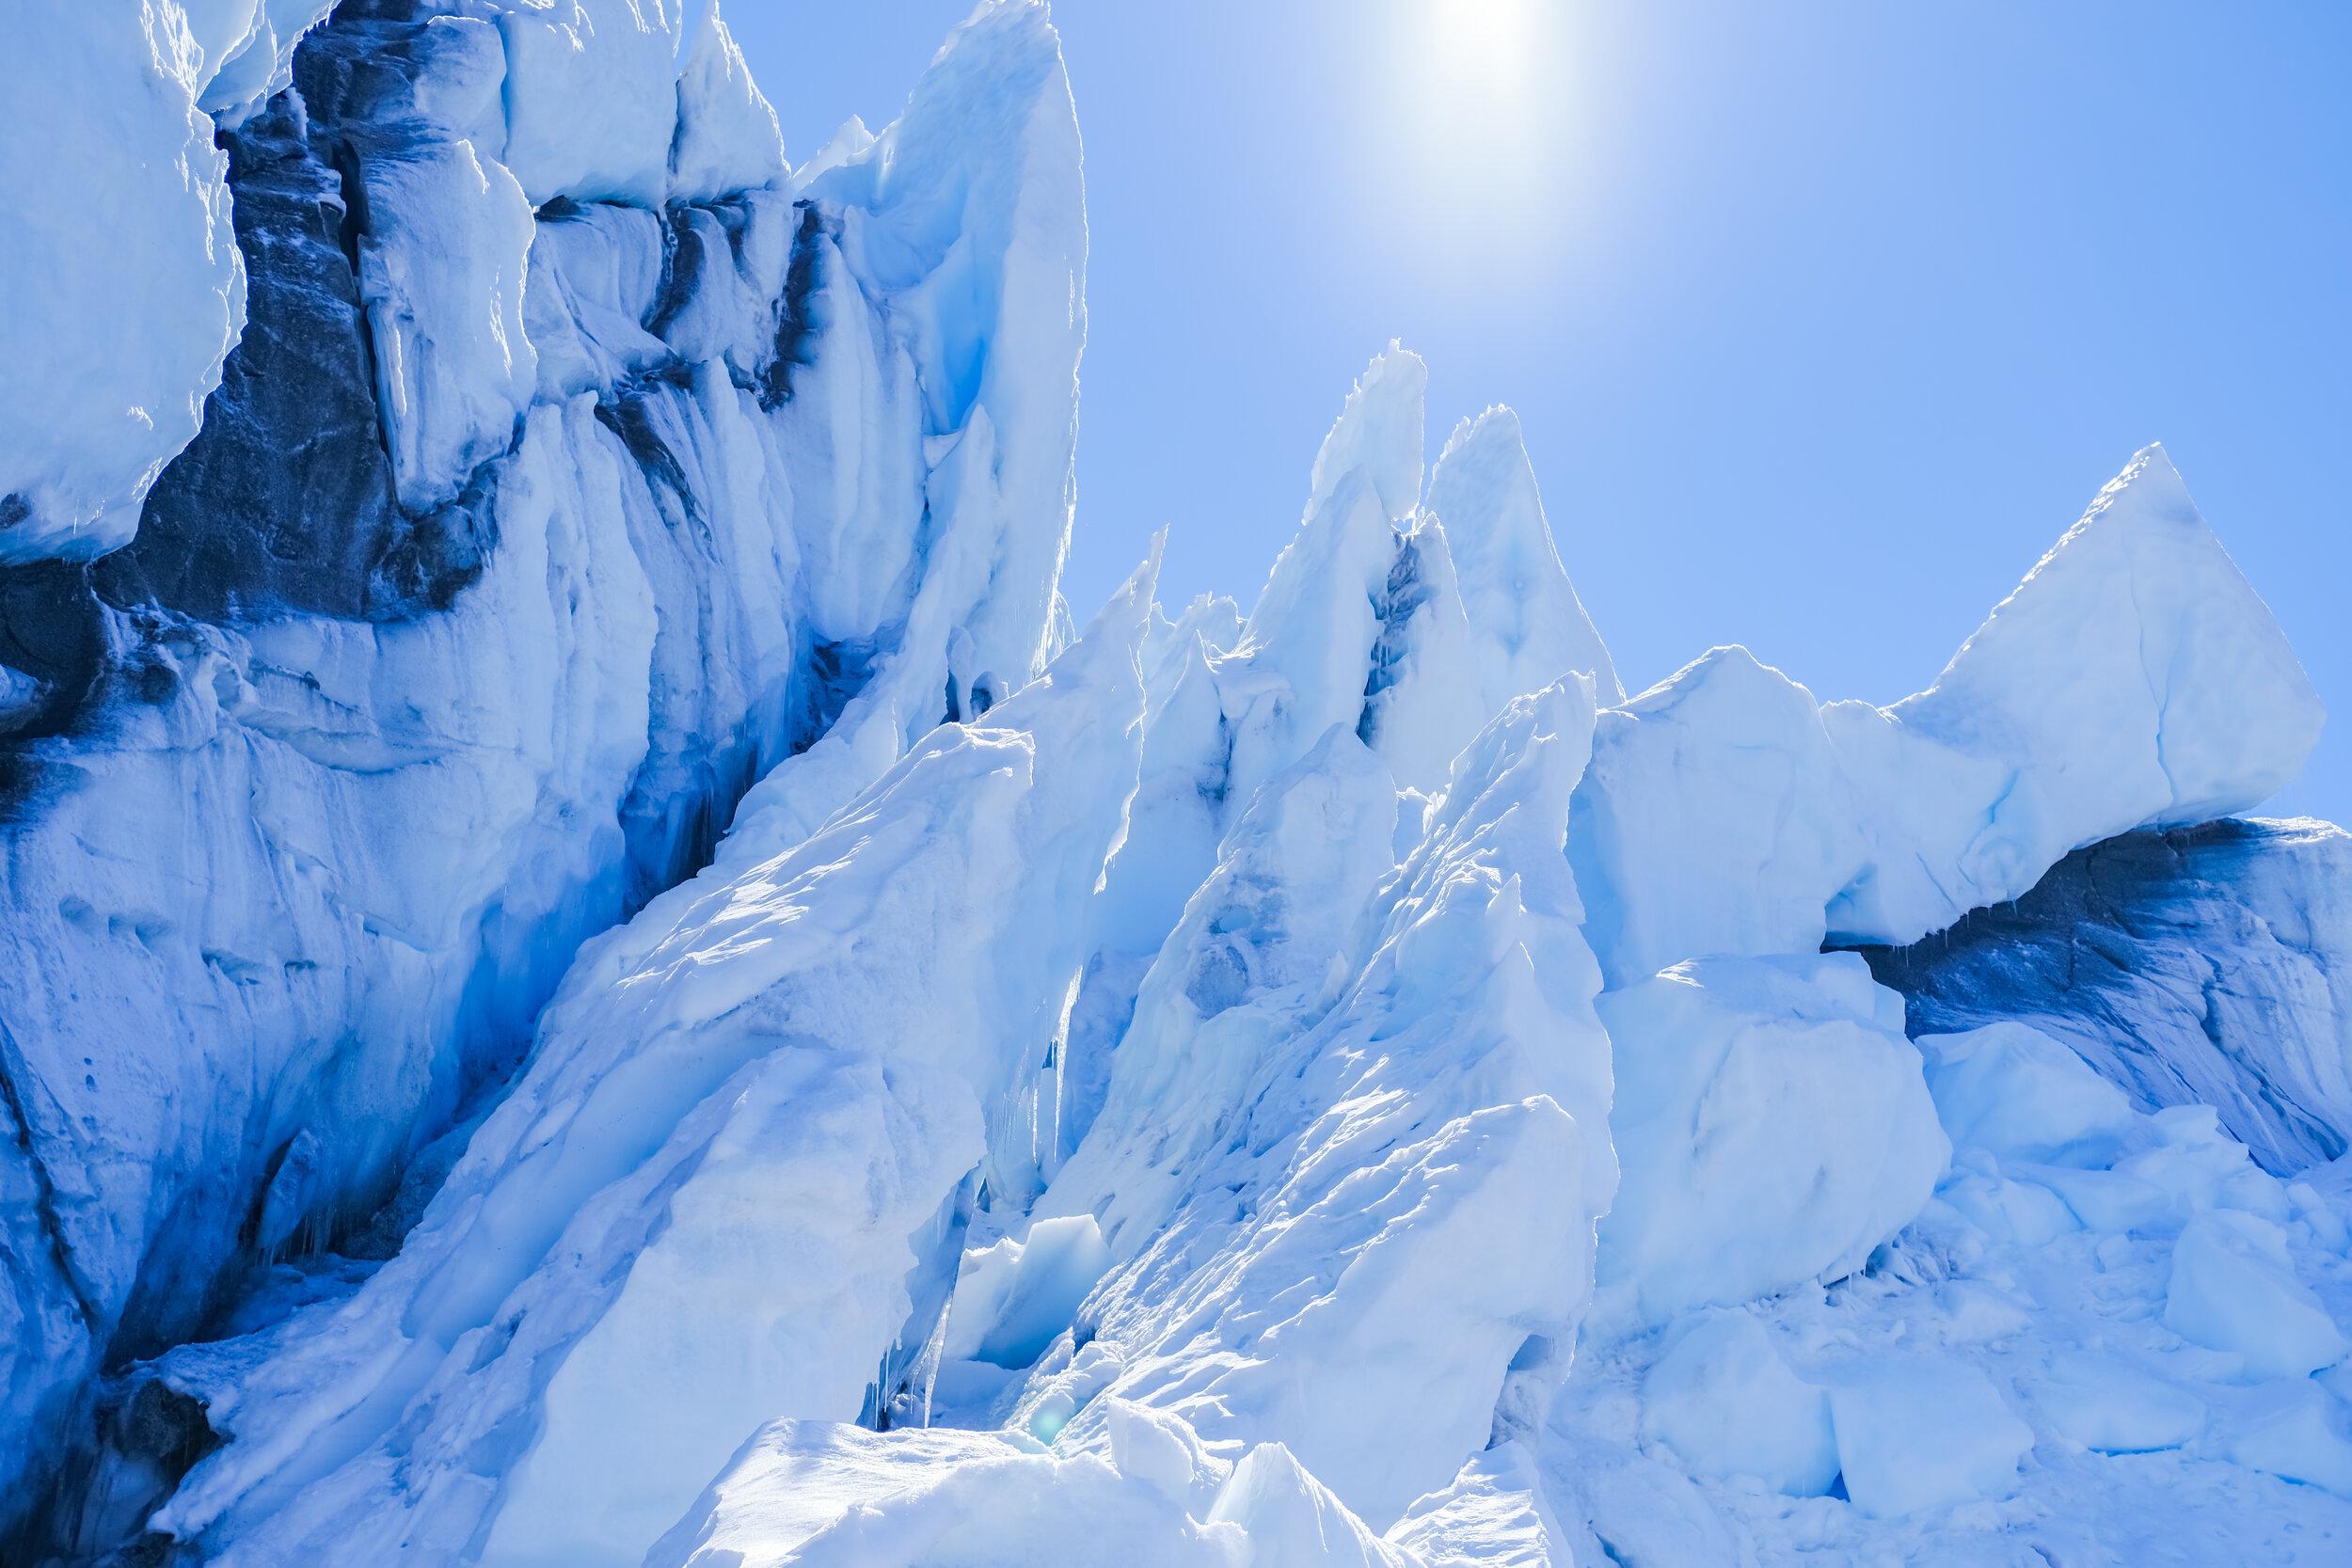 Engagement_Session_Matanuska_Glacier_Alaska_Emily_Lester_Photography-736.jpg